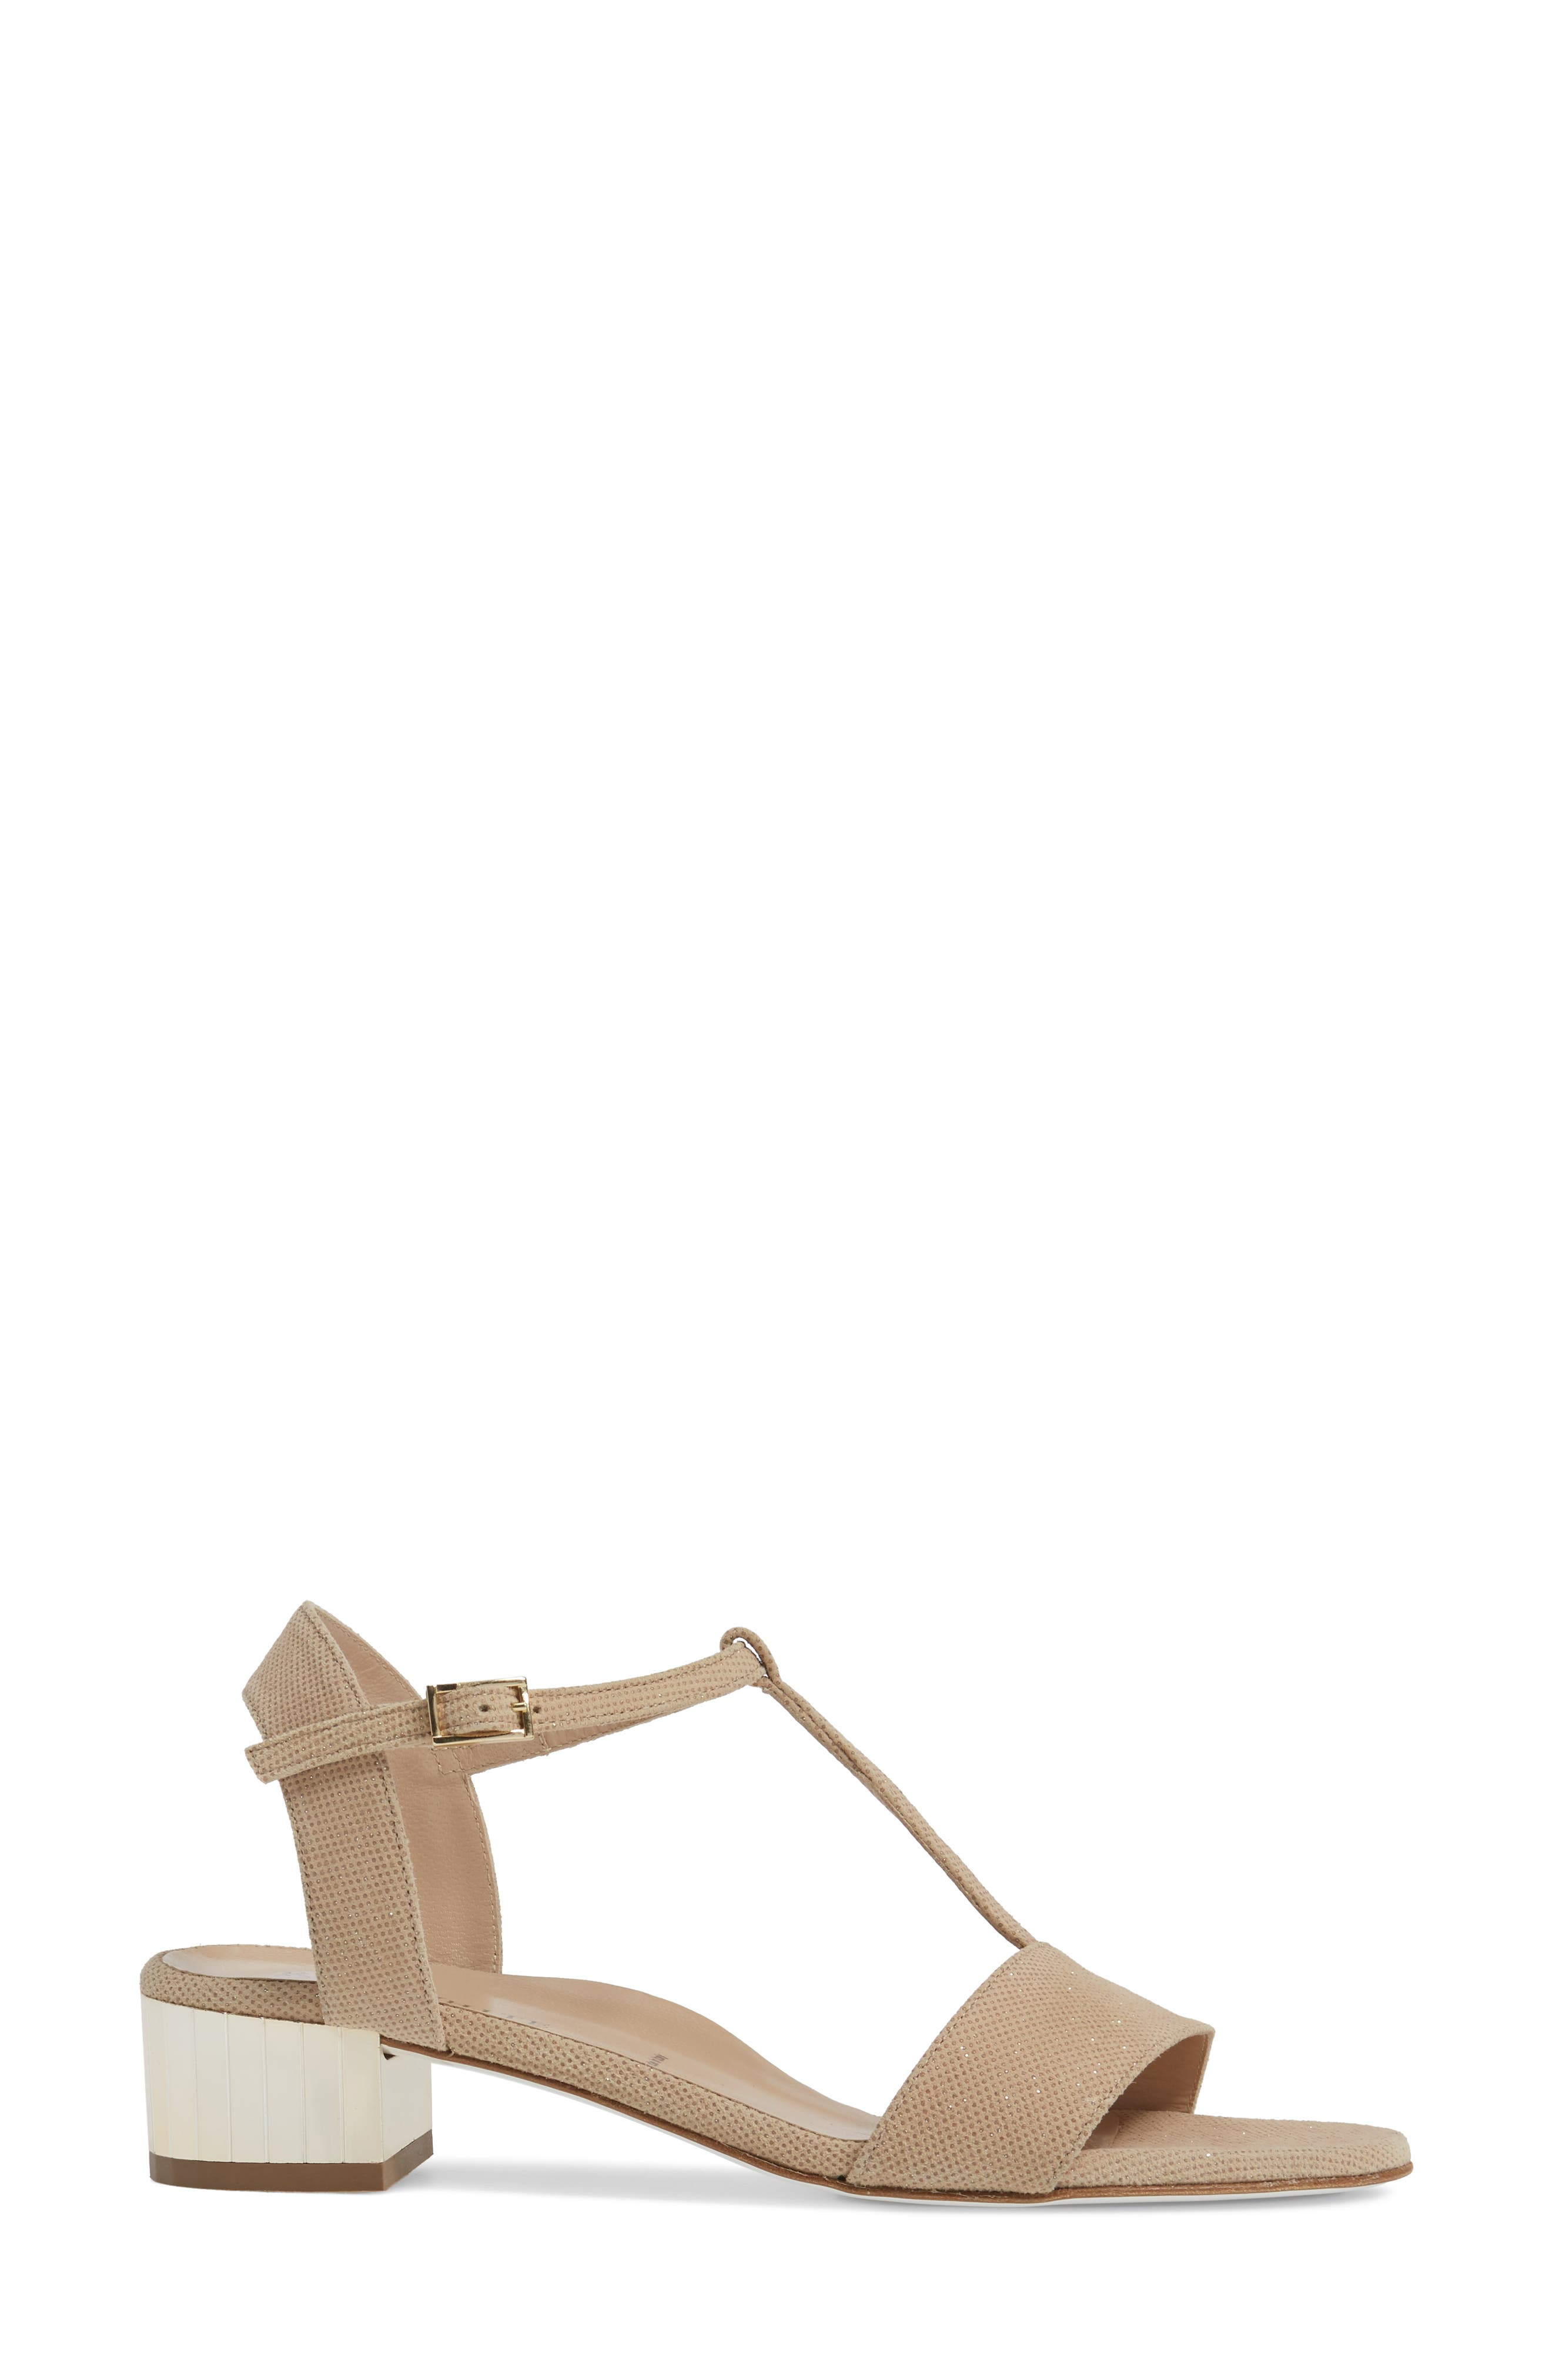 Alternate Image 3  - Ron White Esme T-Strap Sandal (Women)